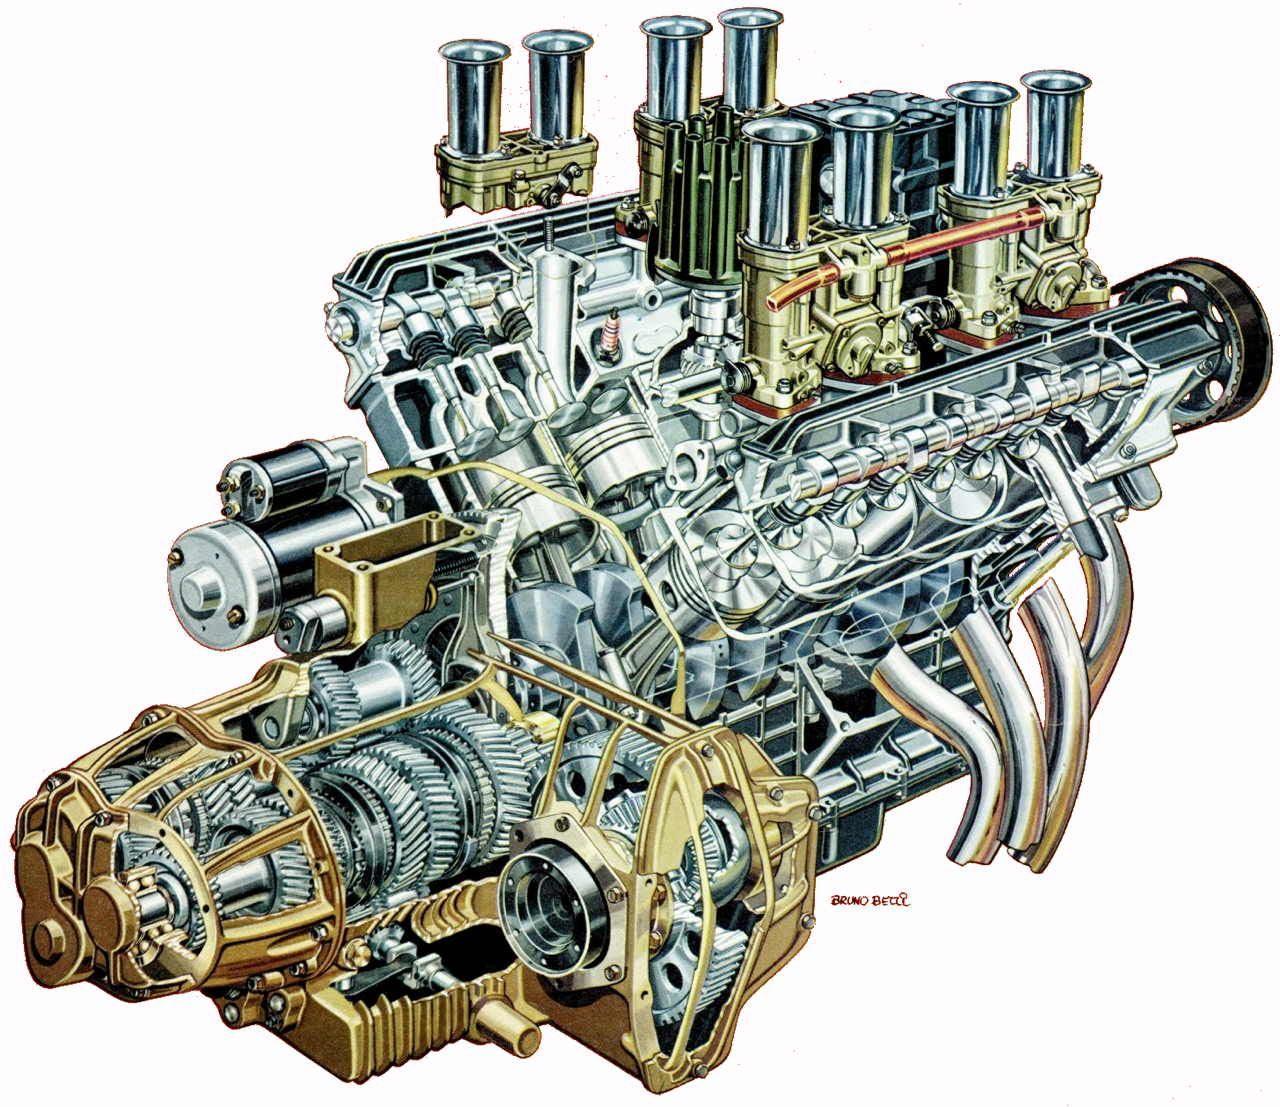 V8 Engine Cutaway Drawing In High Quality